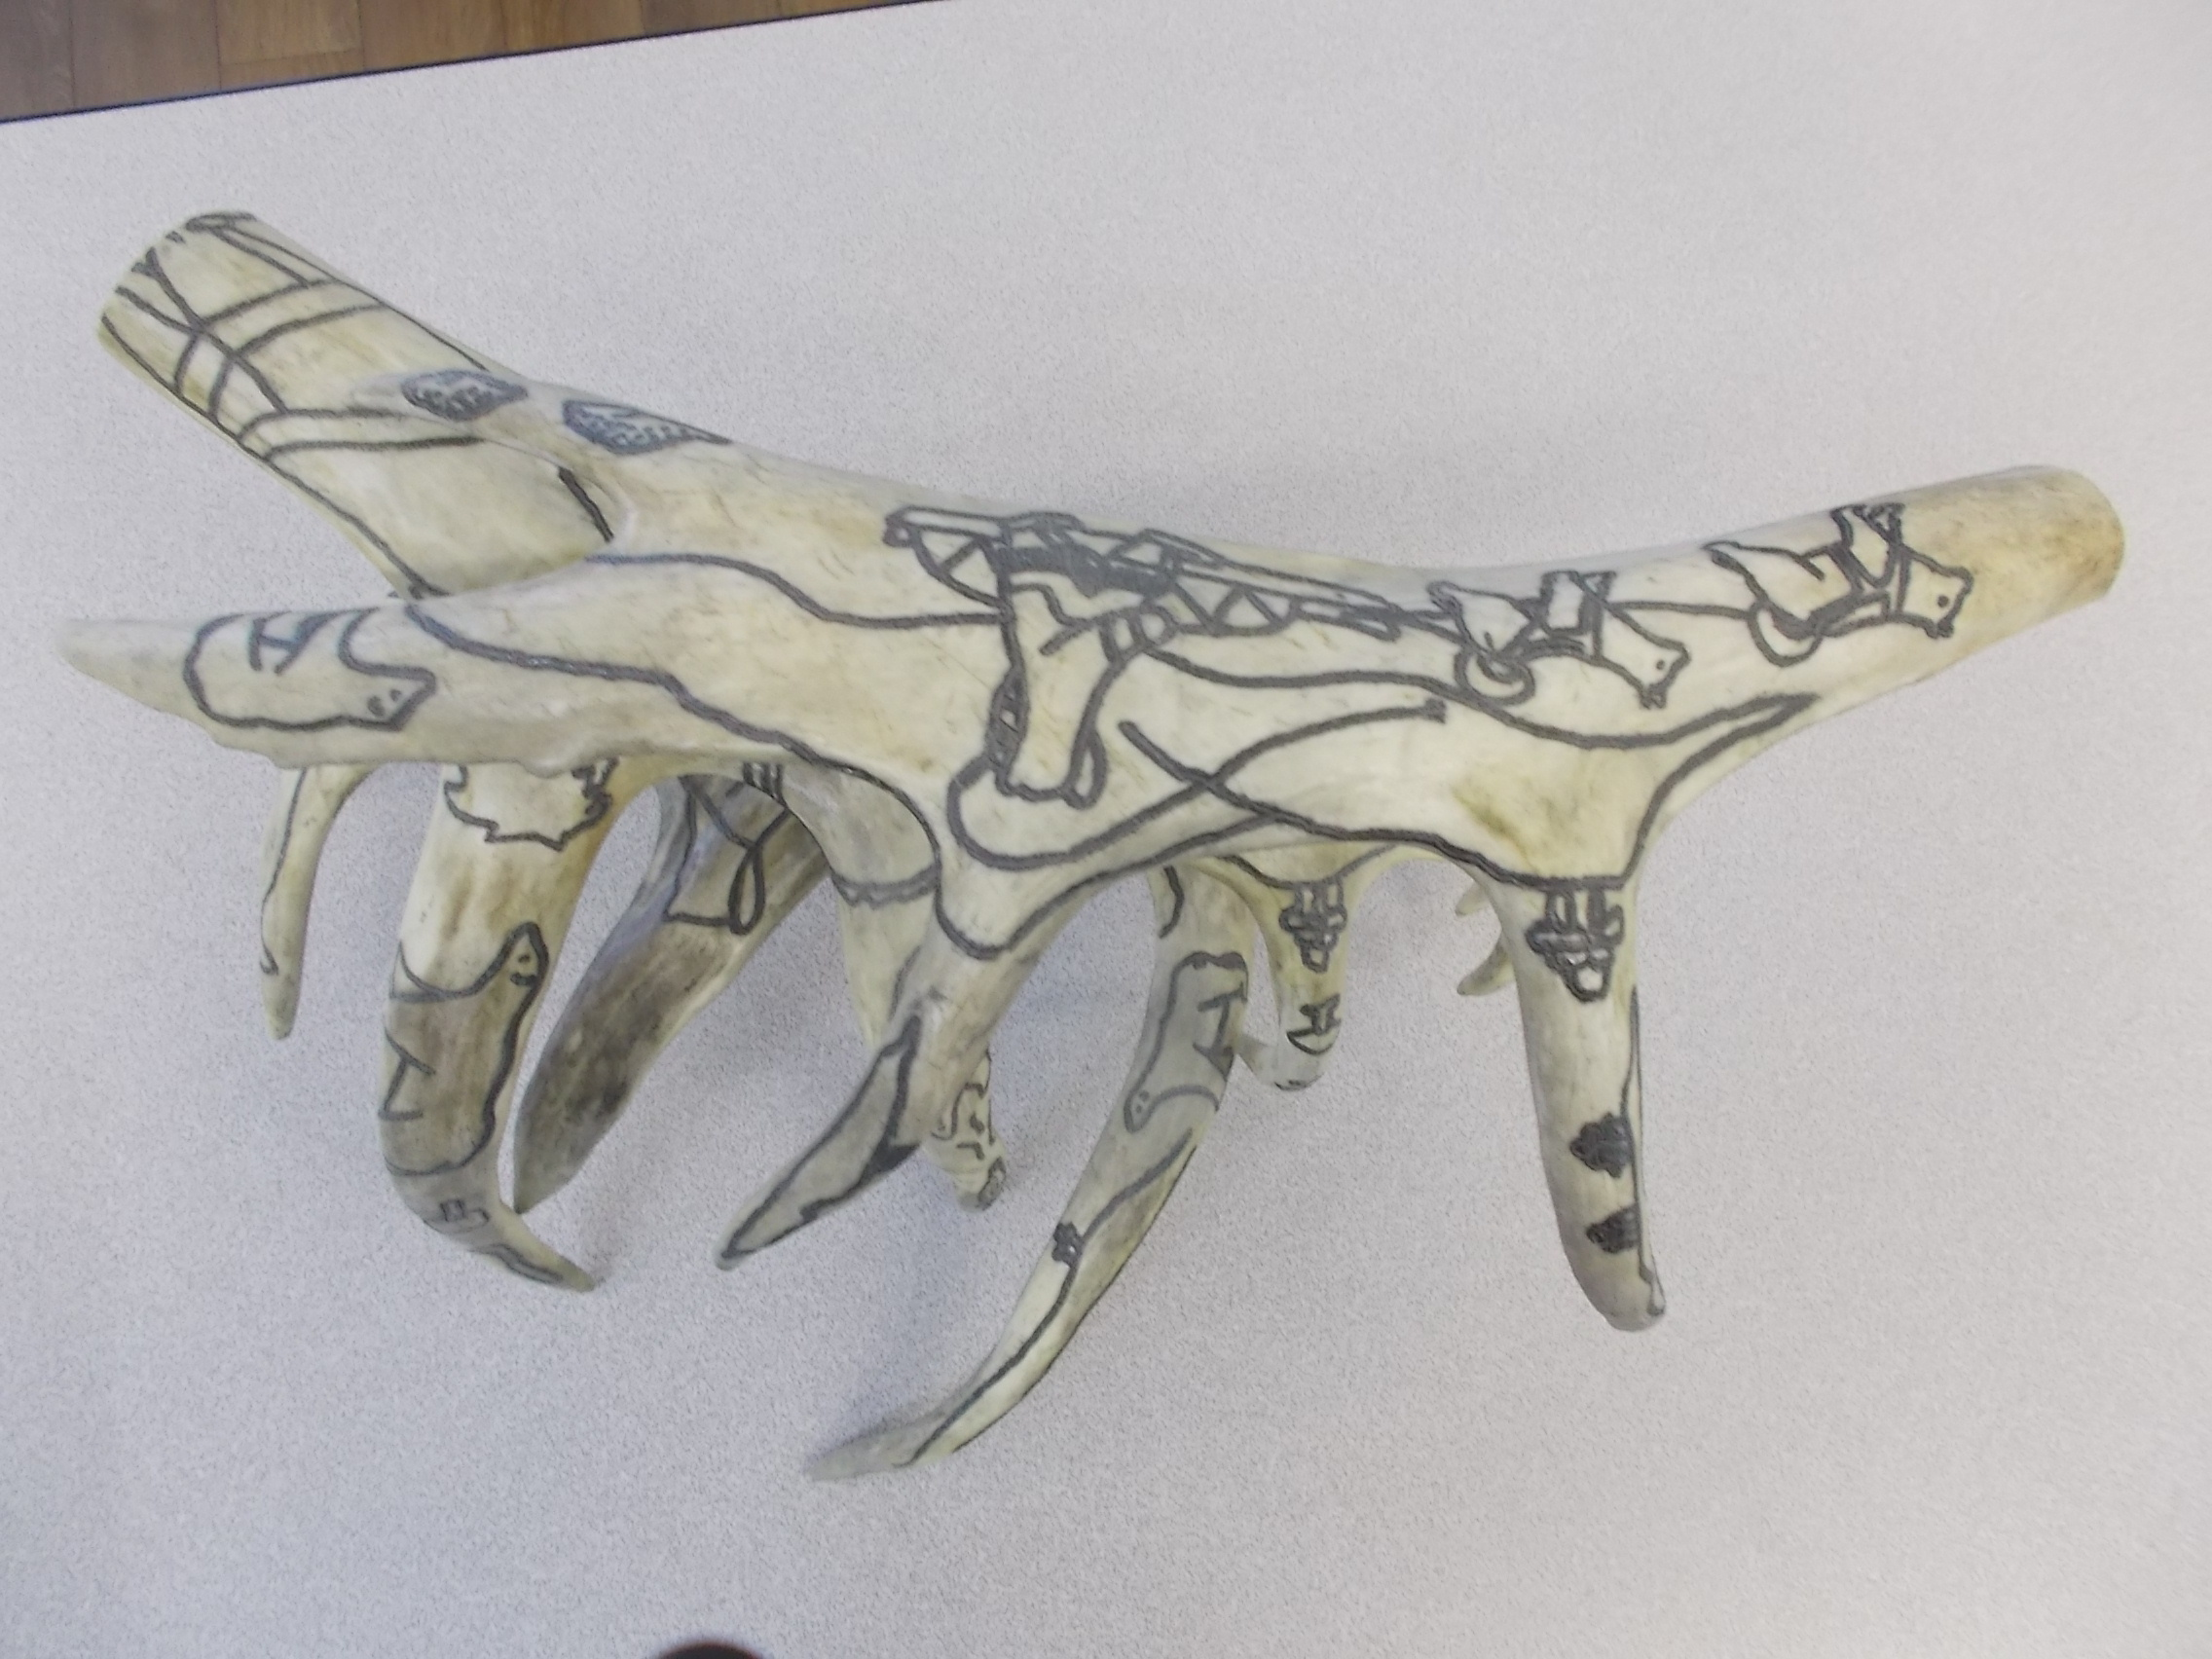 Caribou antler sculpture